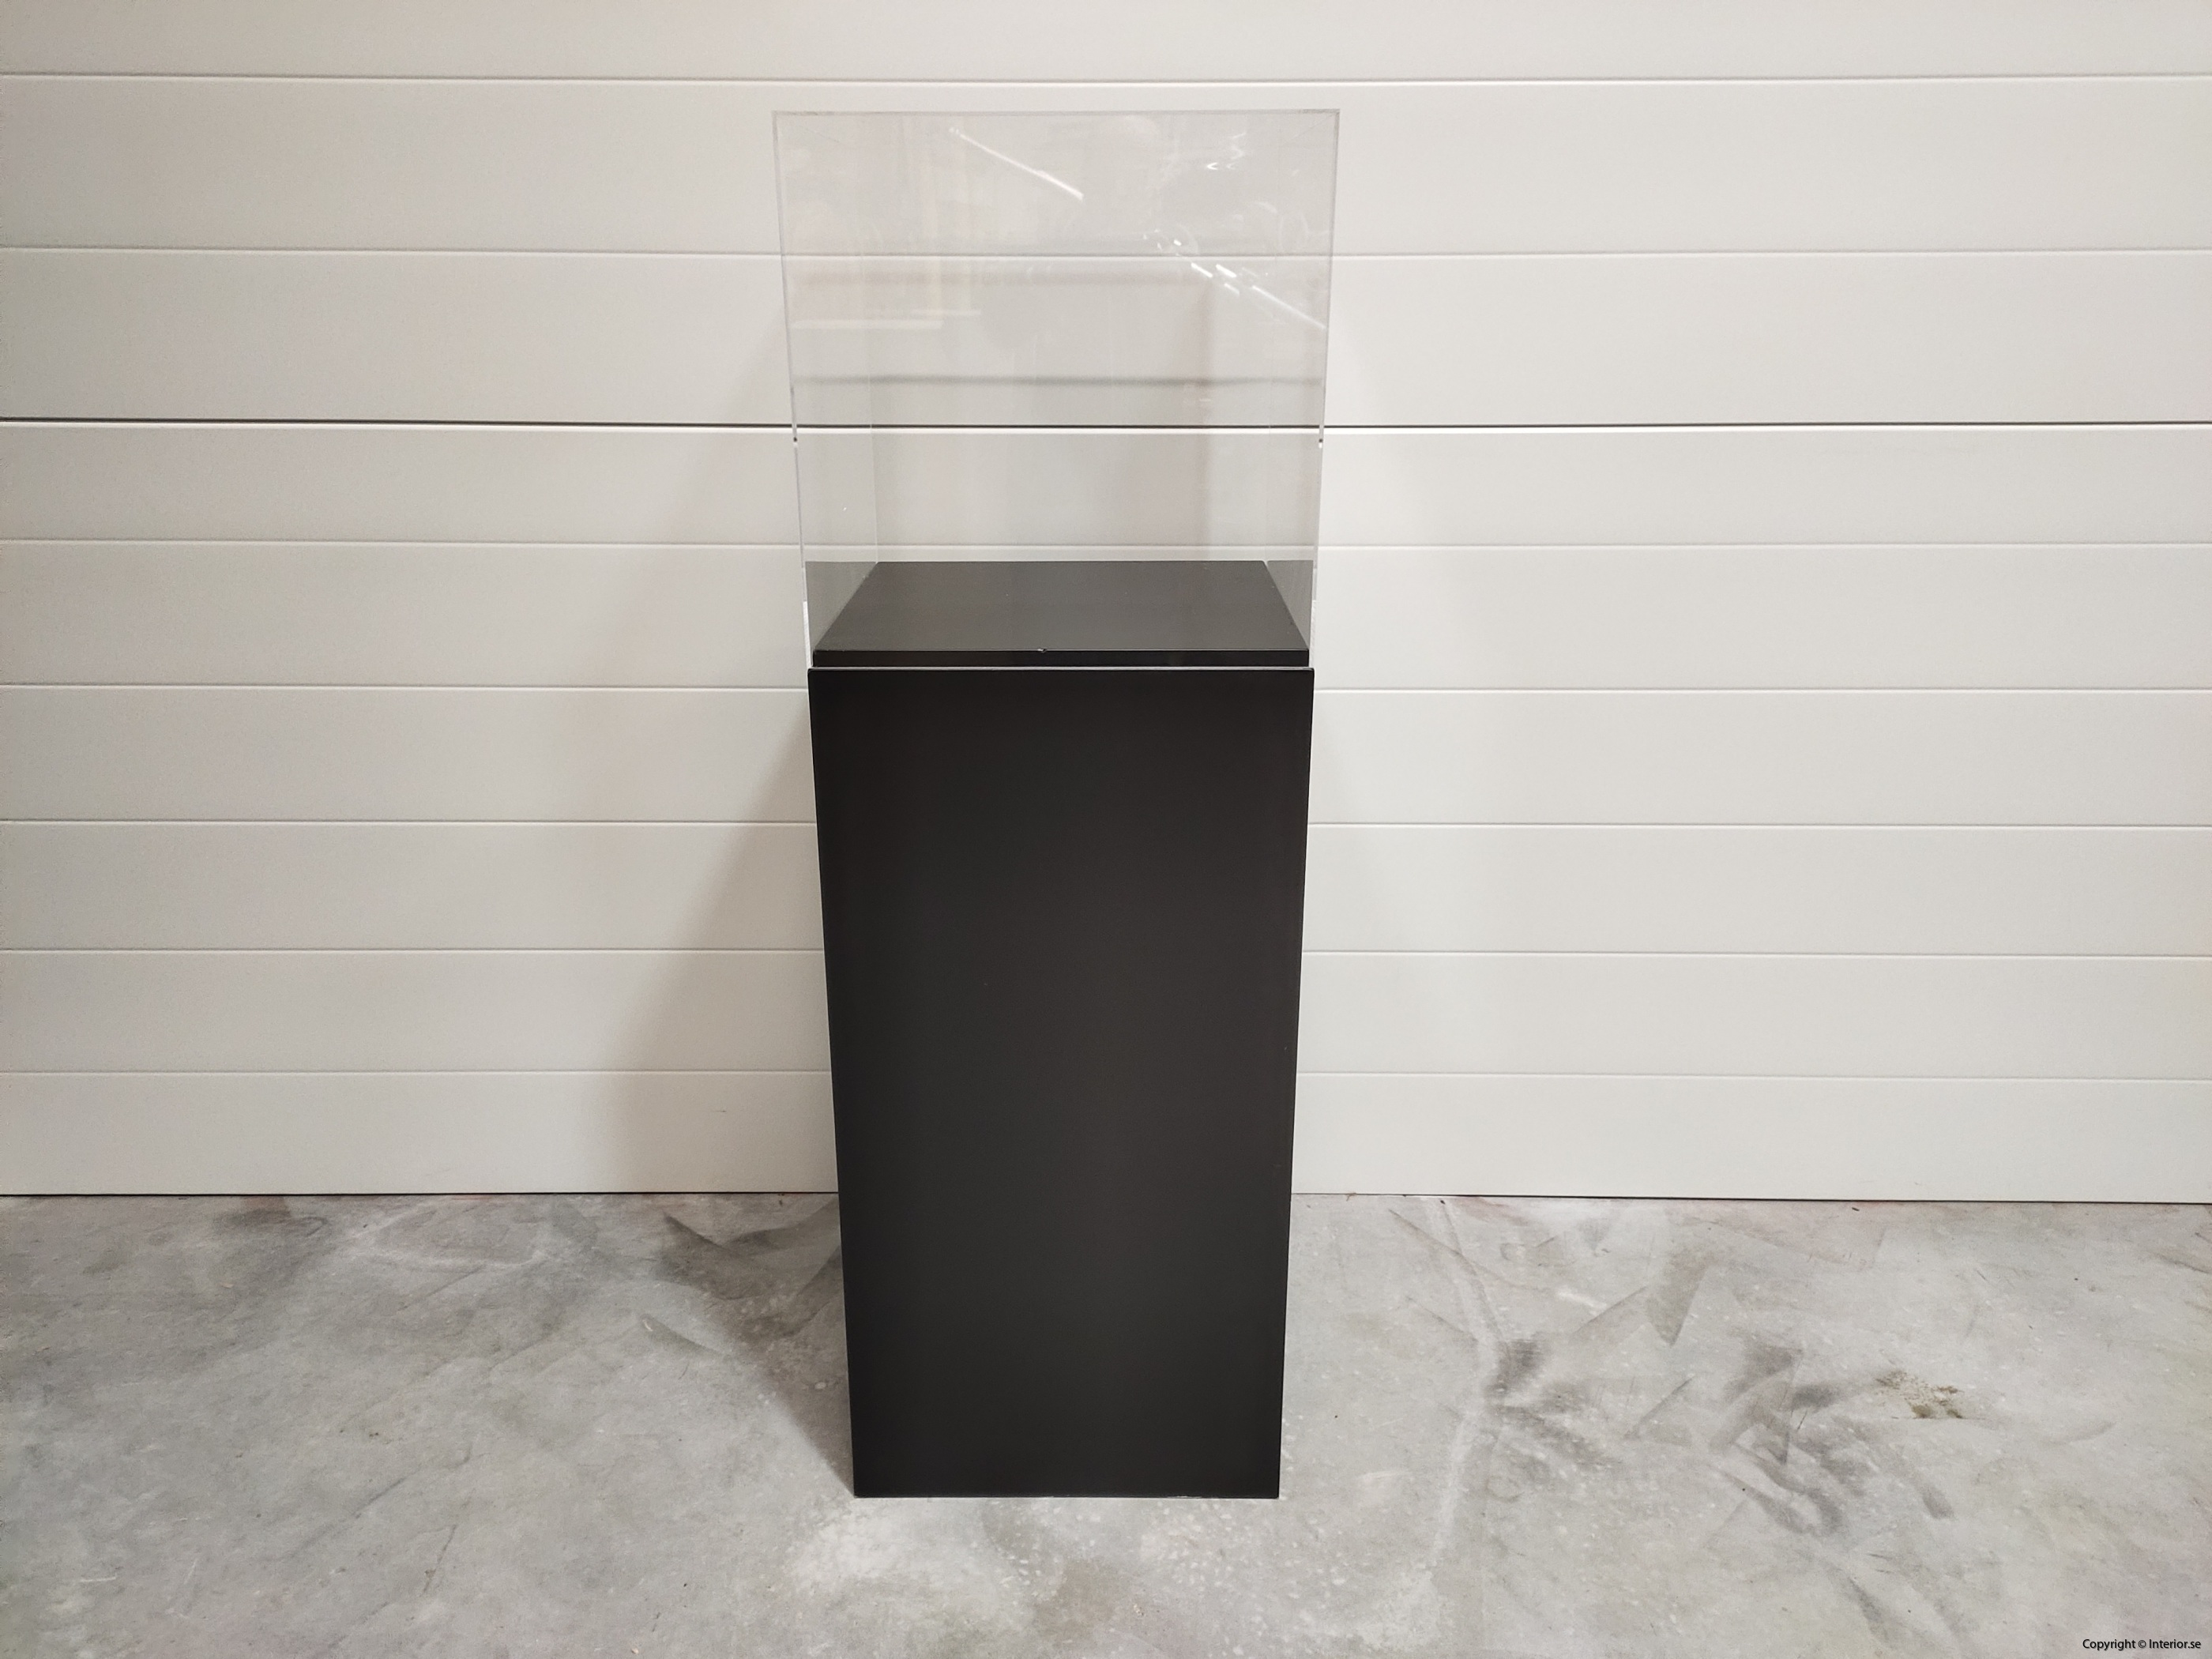 Utställningsmonter  Piedestal - 152 cm hyra monter stockholm